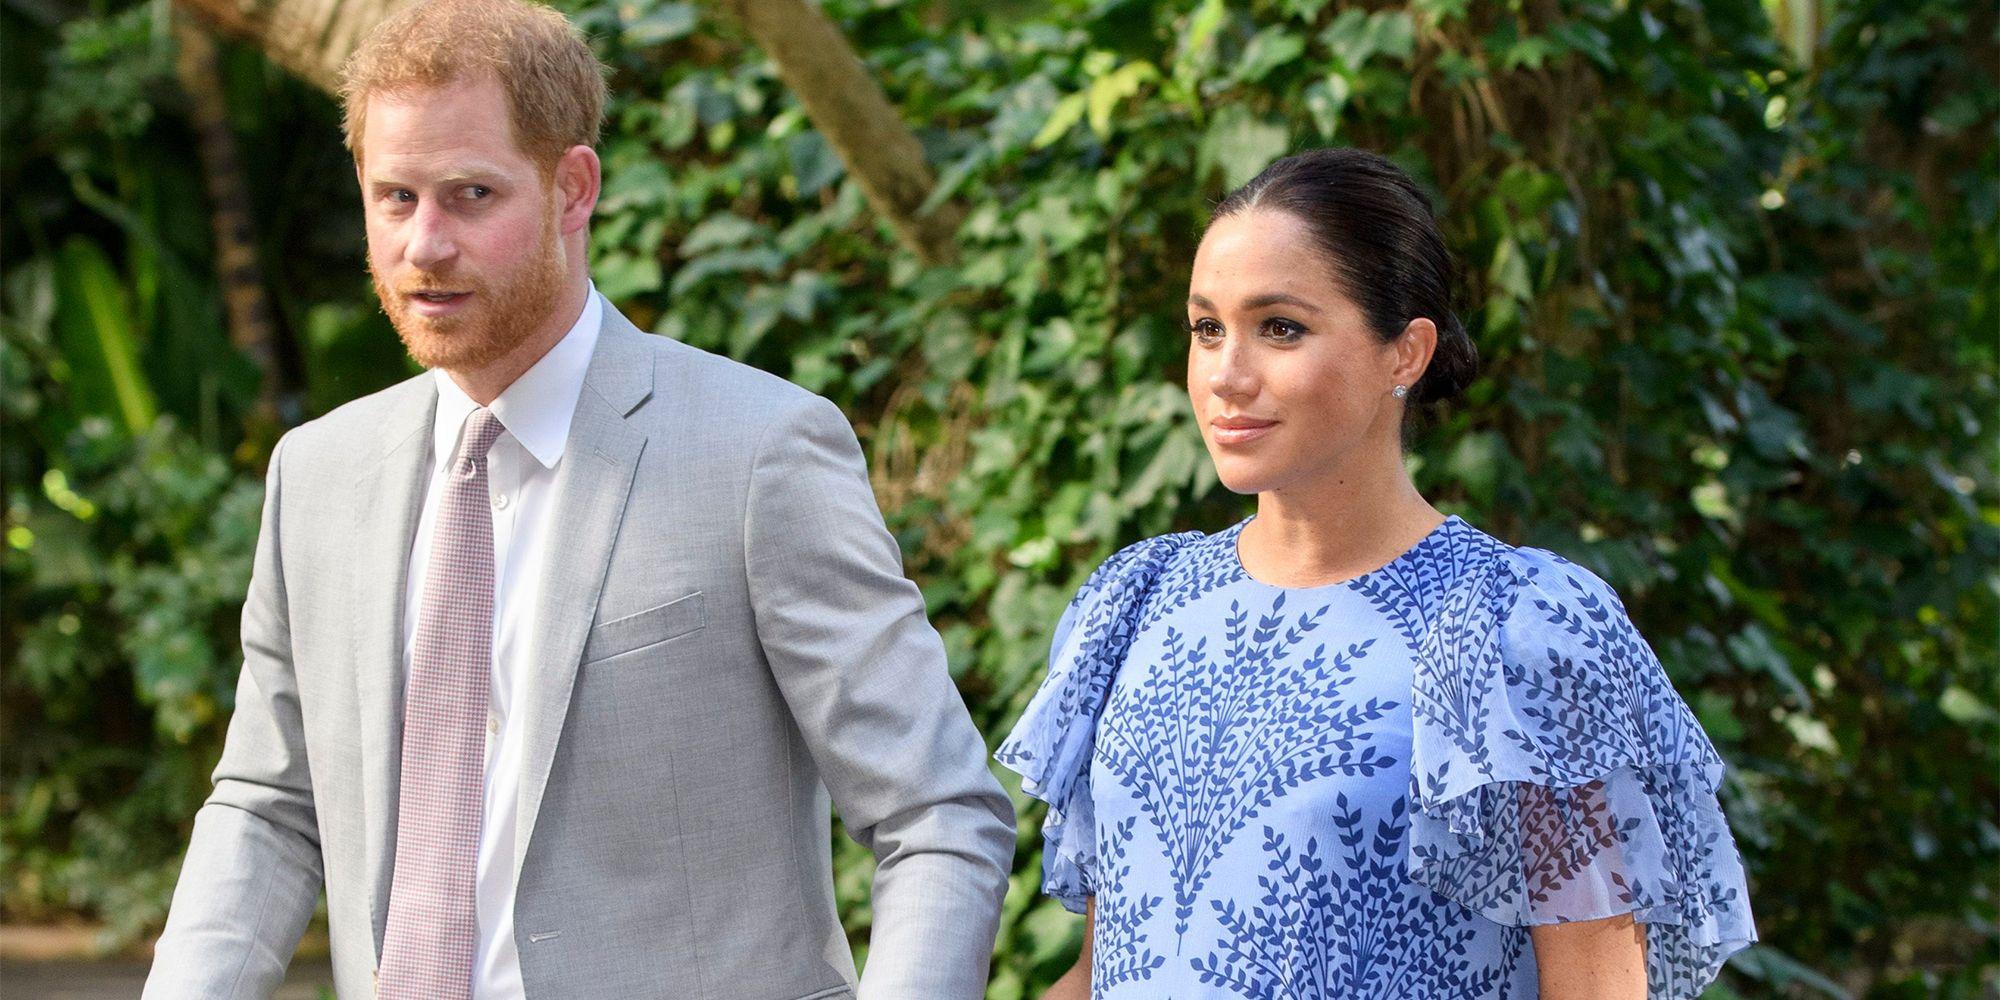 9a87a0059f Meghan Markle Wears Custom Carolina Herrera to Meet the King of Morocco with  Prince Harry